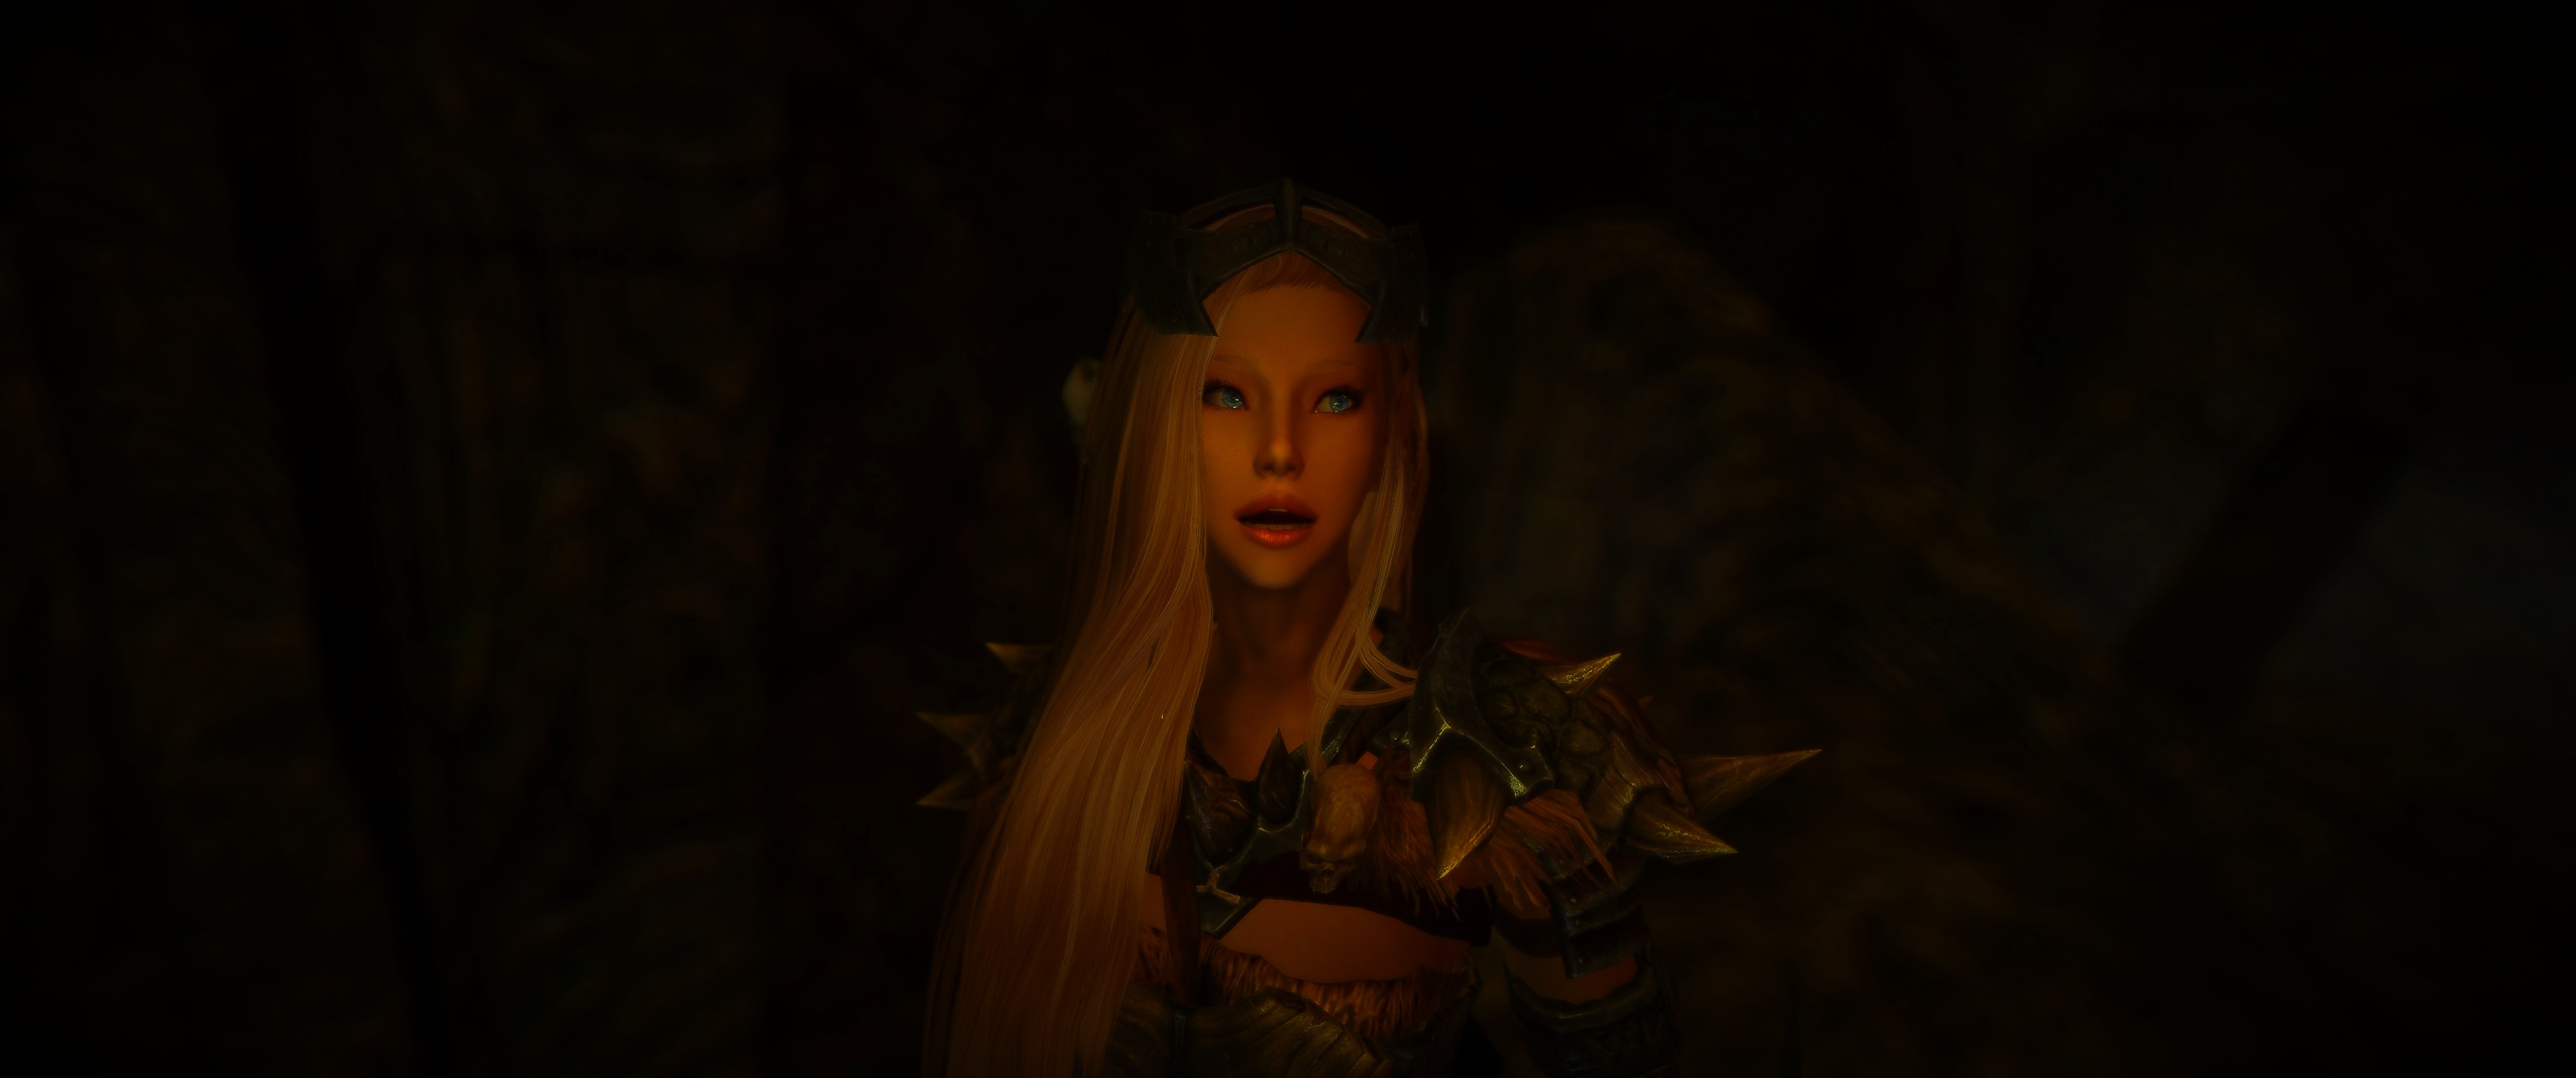 20171217151359_1.jpg - Elder Scrolls 5: Skyrim, the